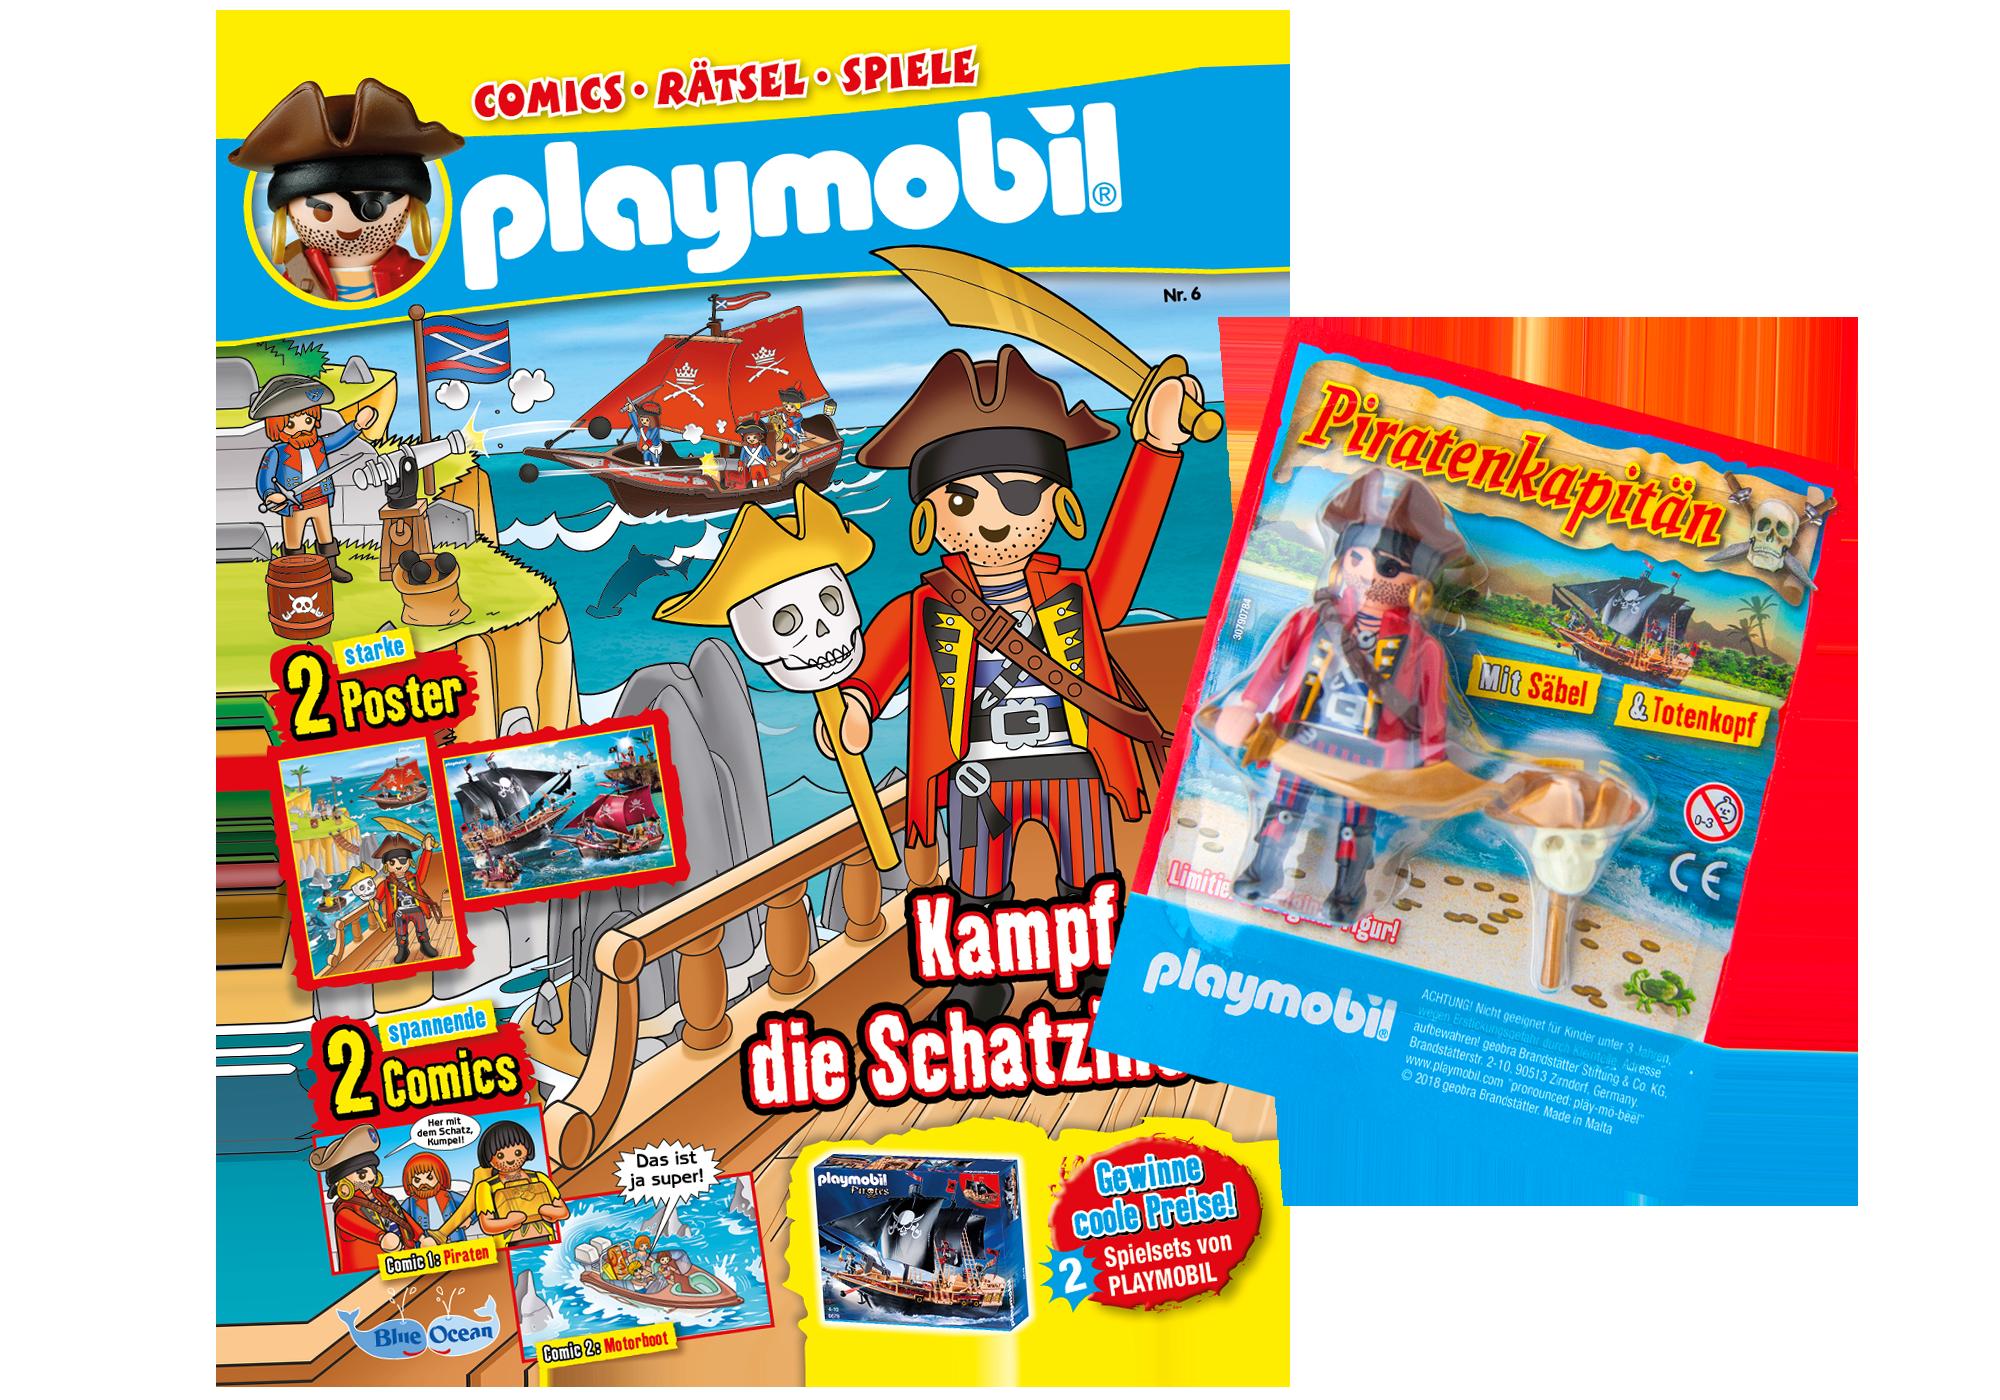 http://media.playmobil.com/i/playmobil/80609_product_detail/PLAYMOBIL-Magazin 6/2018 (Heft 63)